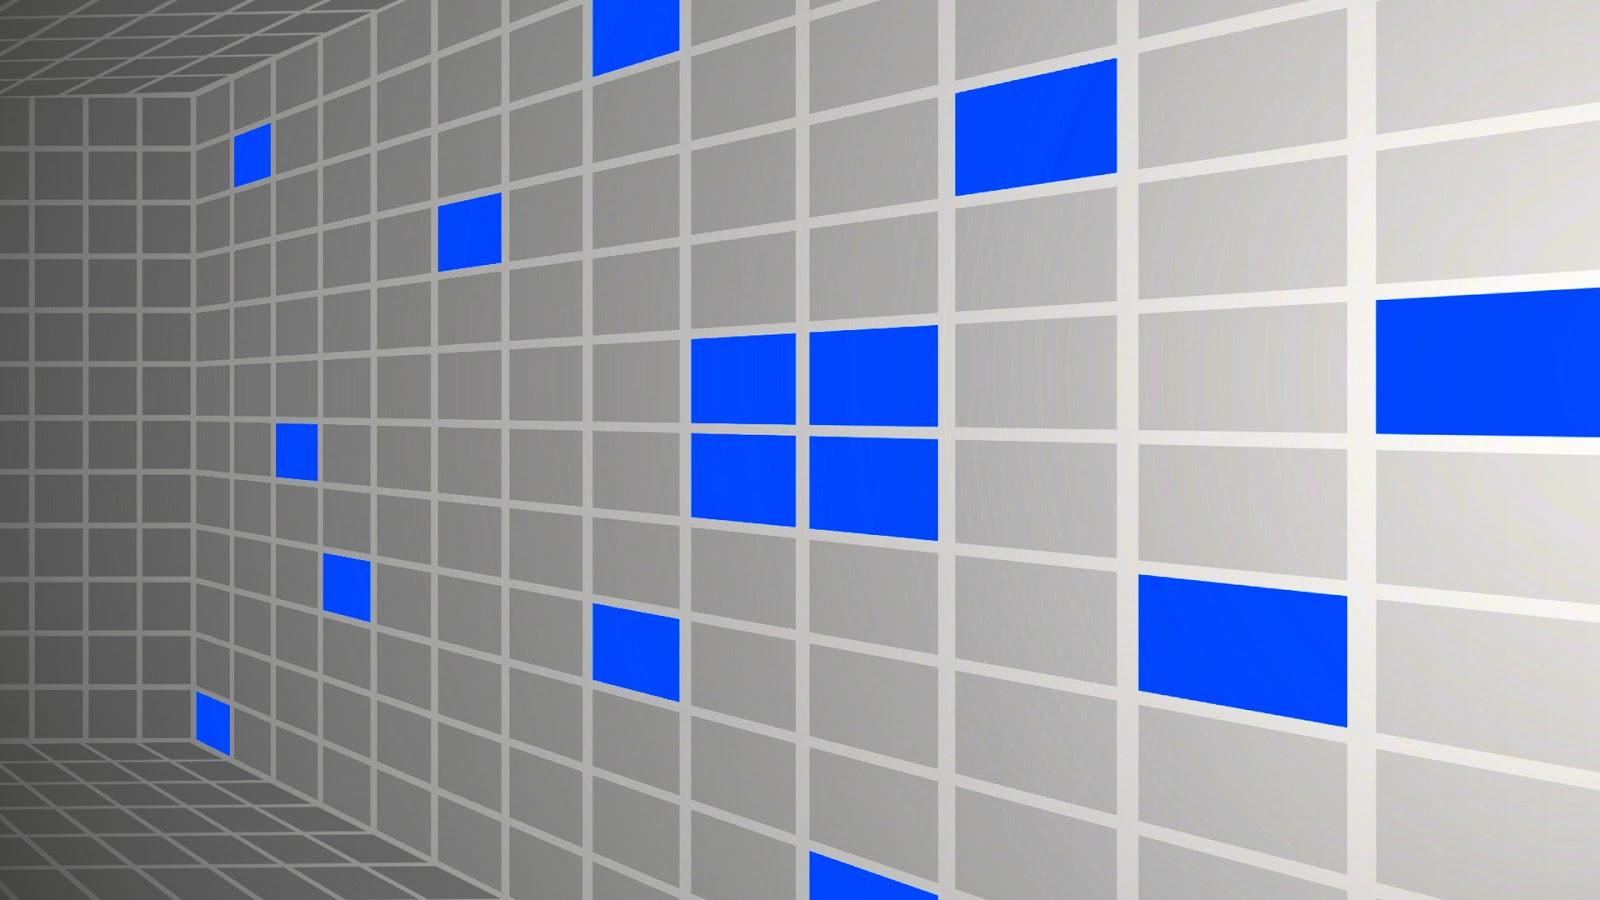 http://4.bp.blogspot.com/-W0S8iZp_Wa4/UJUUHLRJhMI/AAAAAAAAHk4/TZuDk5c3nKY/s1600/Windows+8+HD+wallpapers+Image00003.jpg